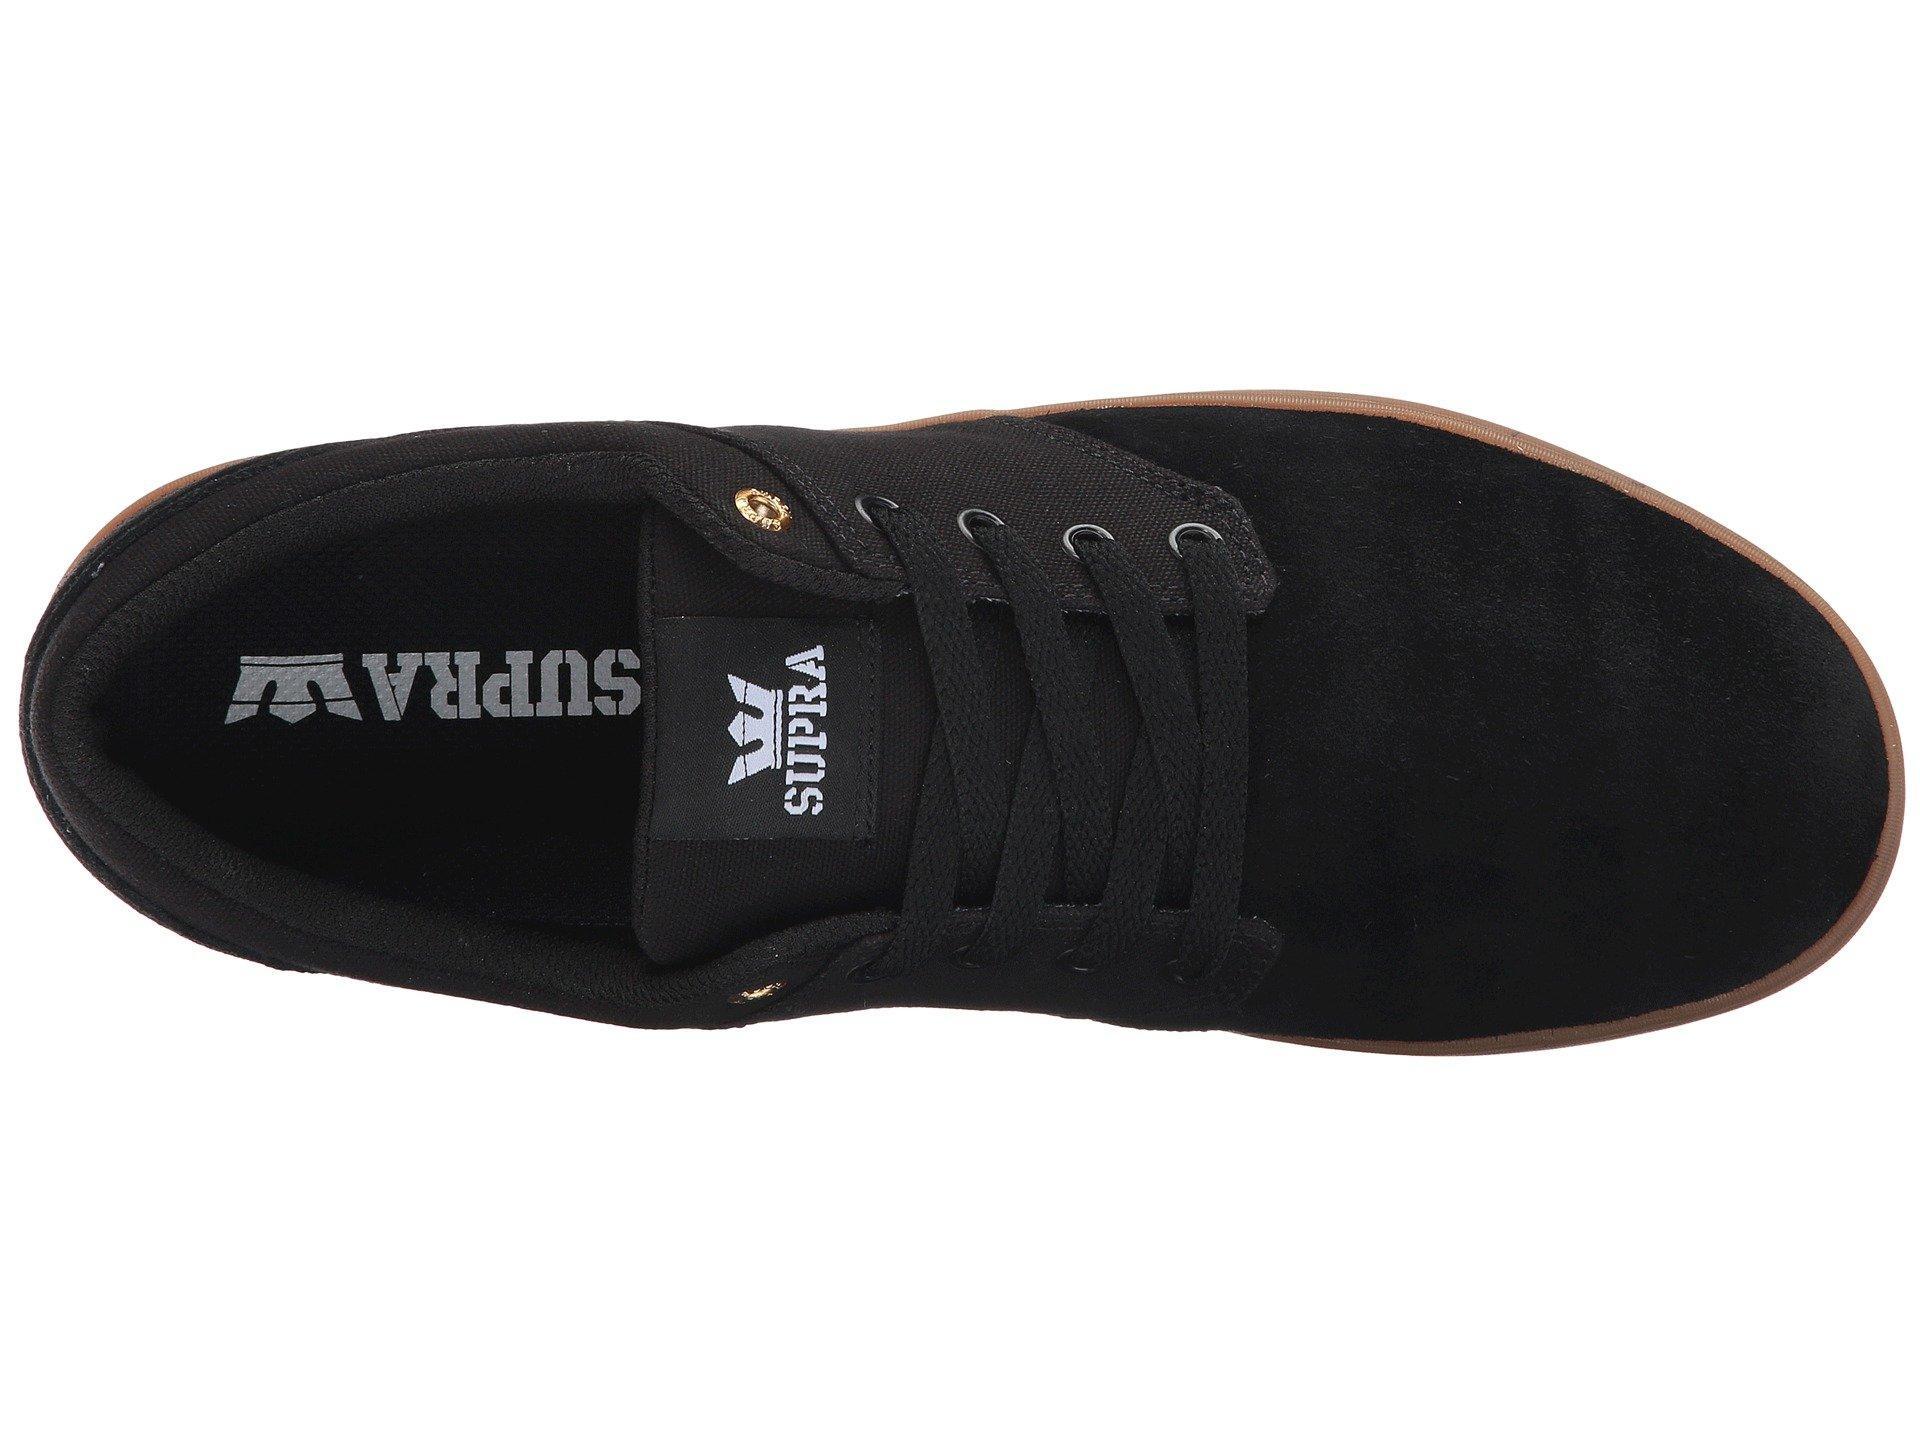 fc43f5567184 Lyst - Supra Chino Court (tan gum) Men s Skate Shoes in Black for Men